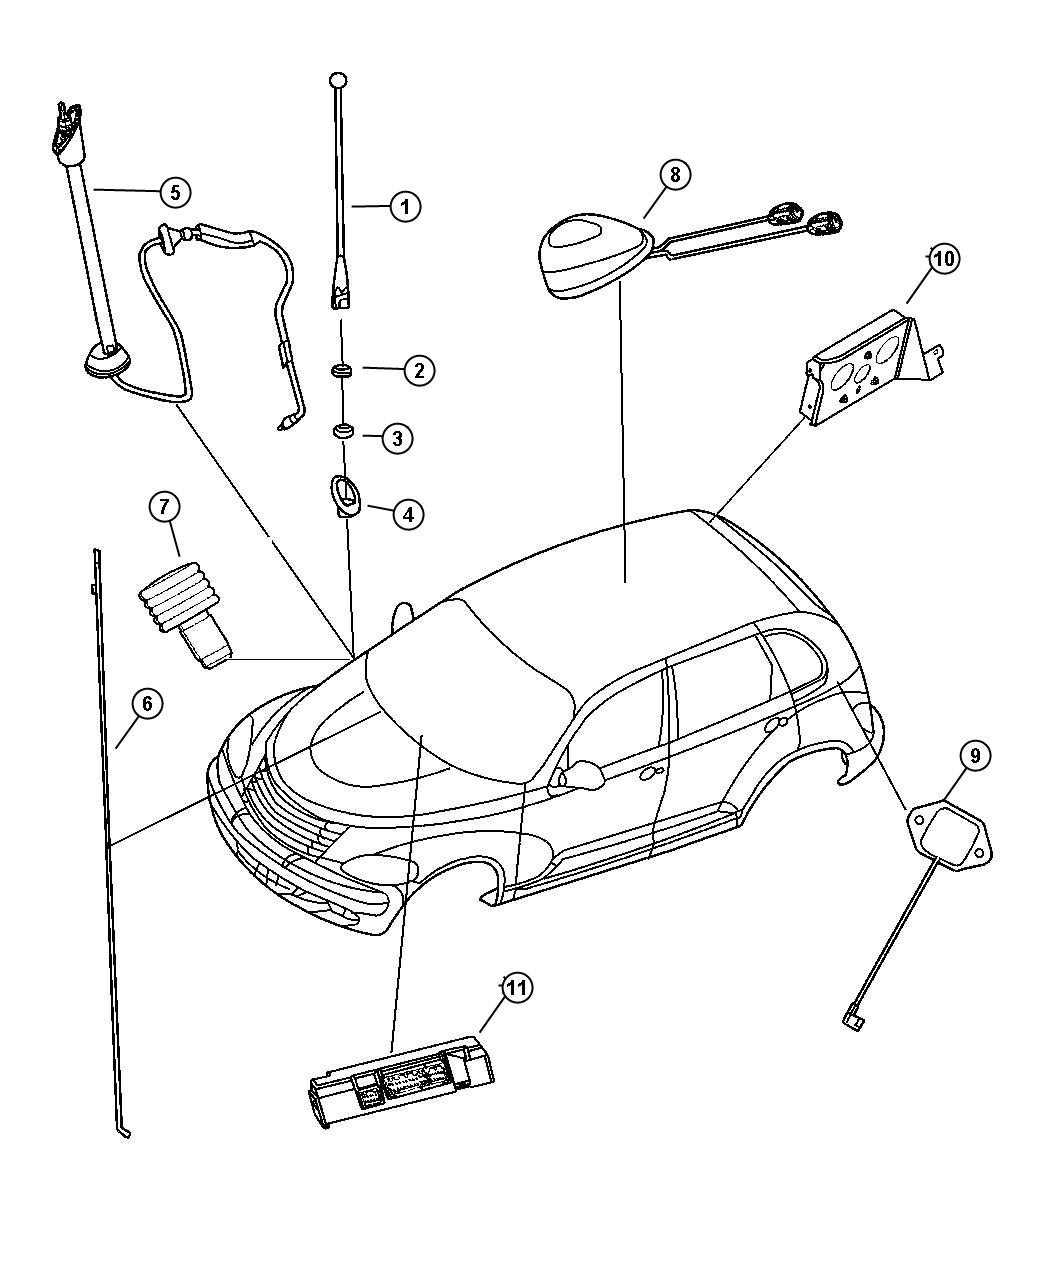 Chrysler Pt Cruiser Module. Telematics. Attaches back of